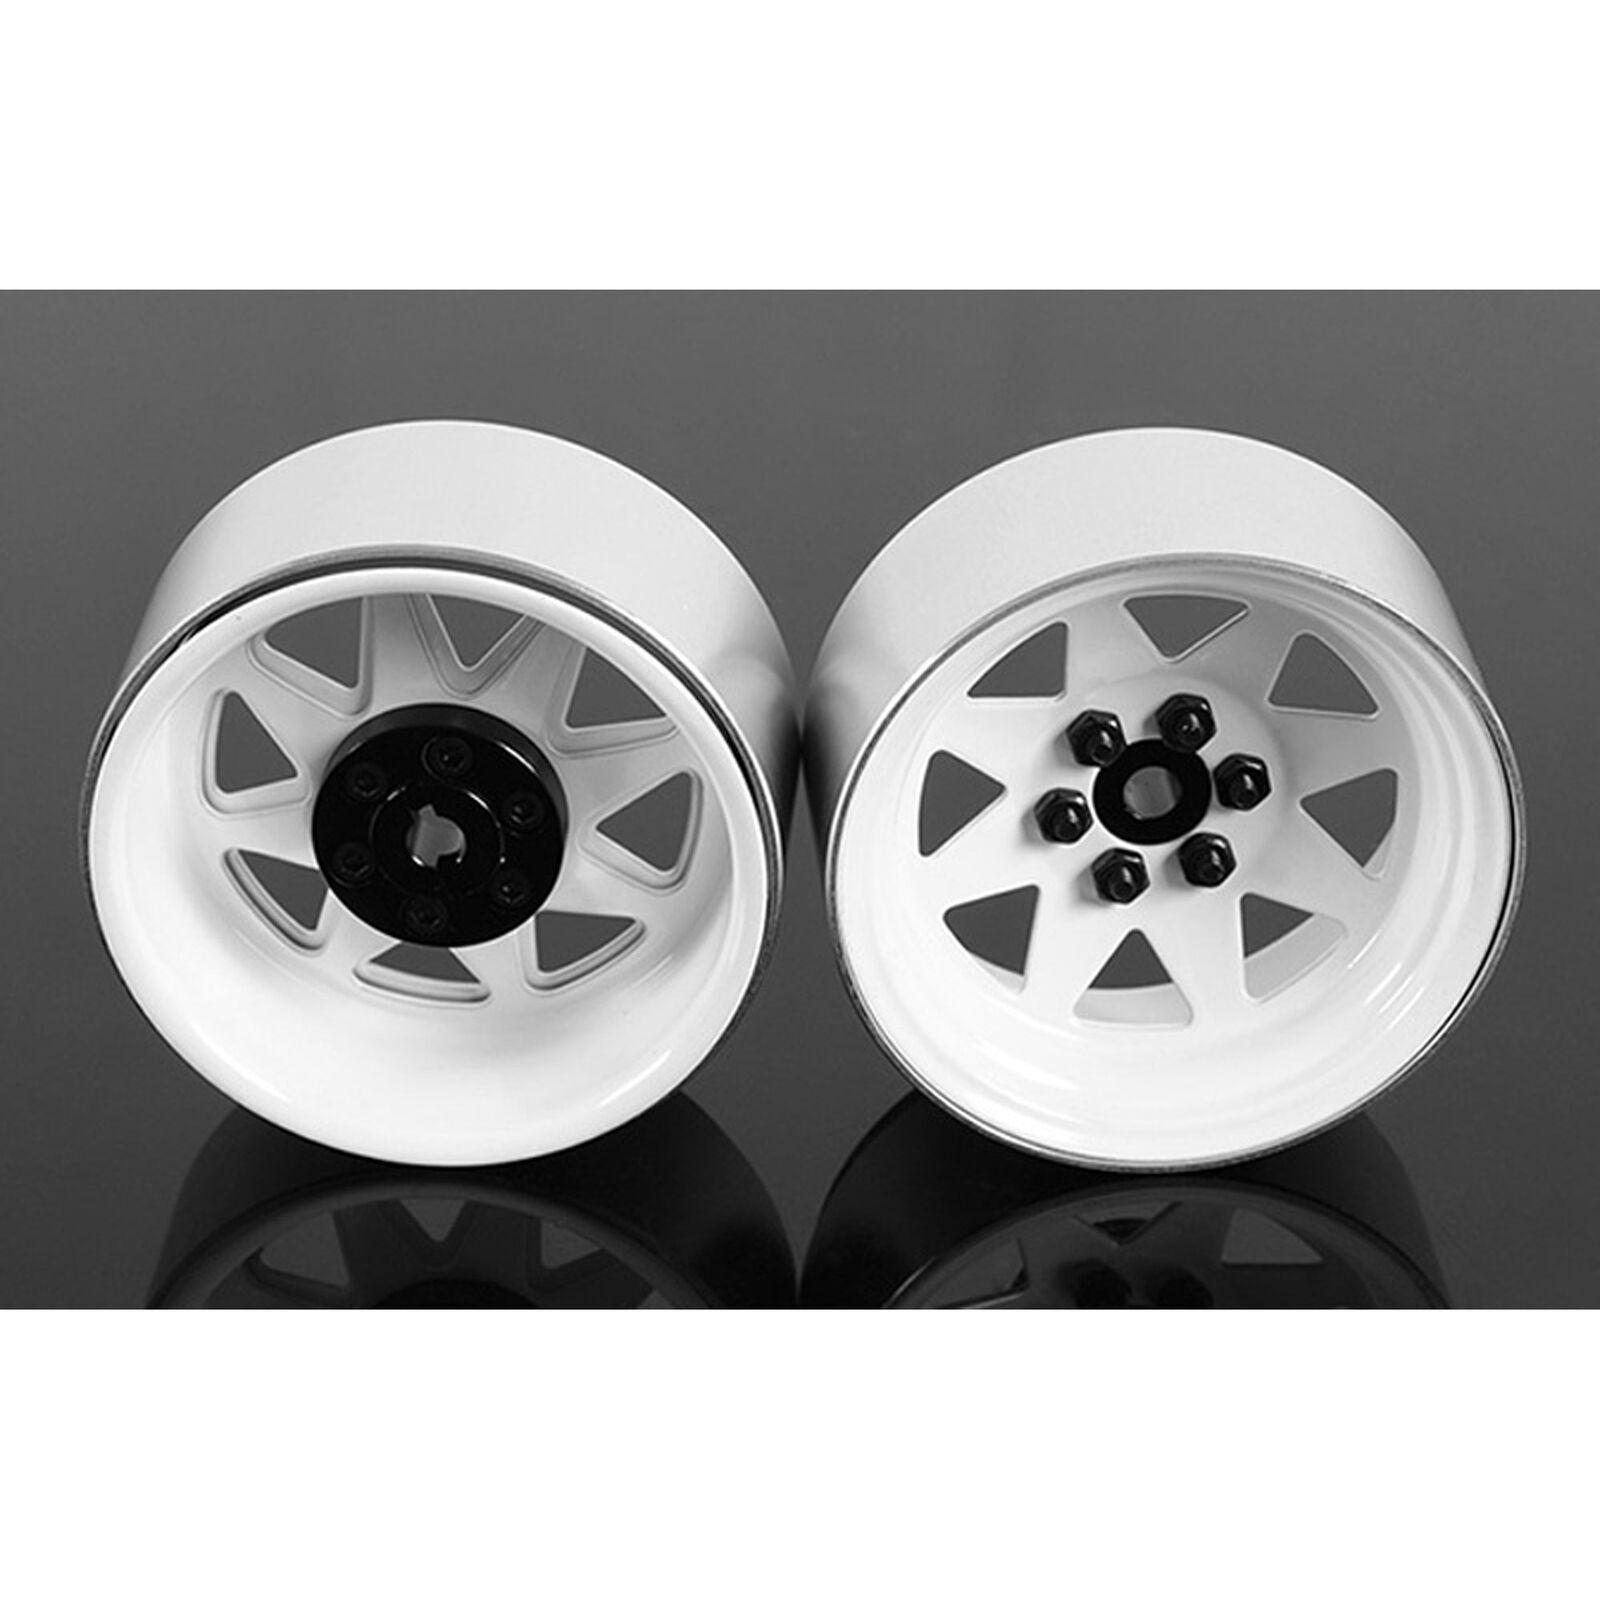 6 Lug Wagon 2.2 Steel Stamped Beadlock Wheel, White (4)